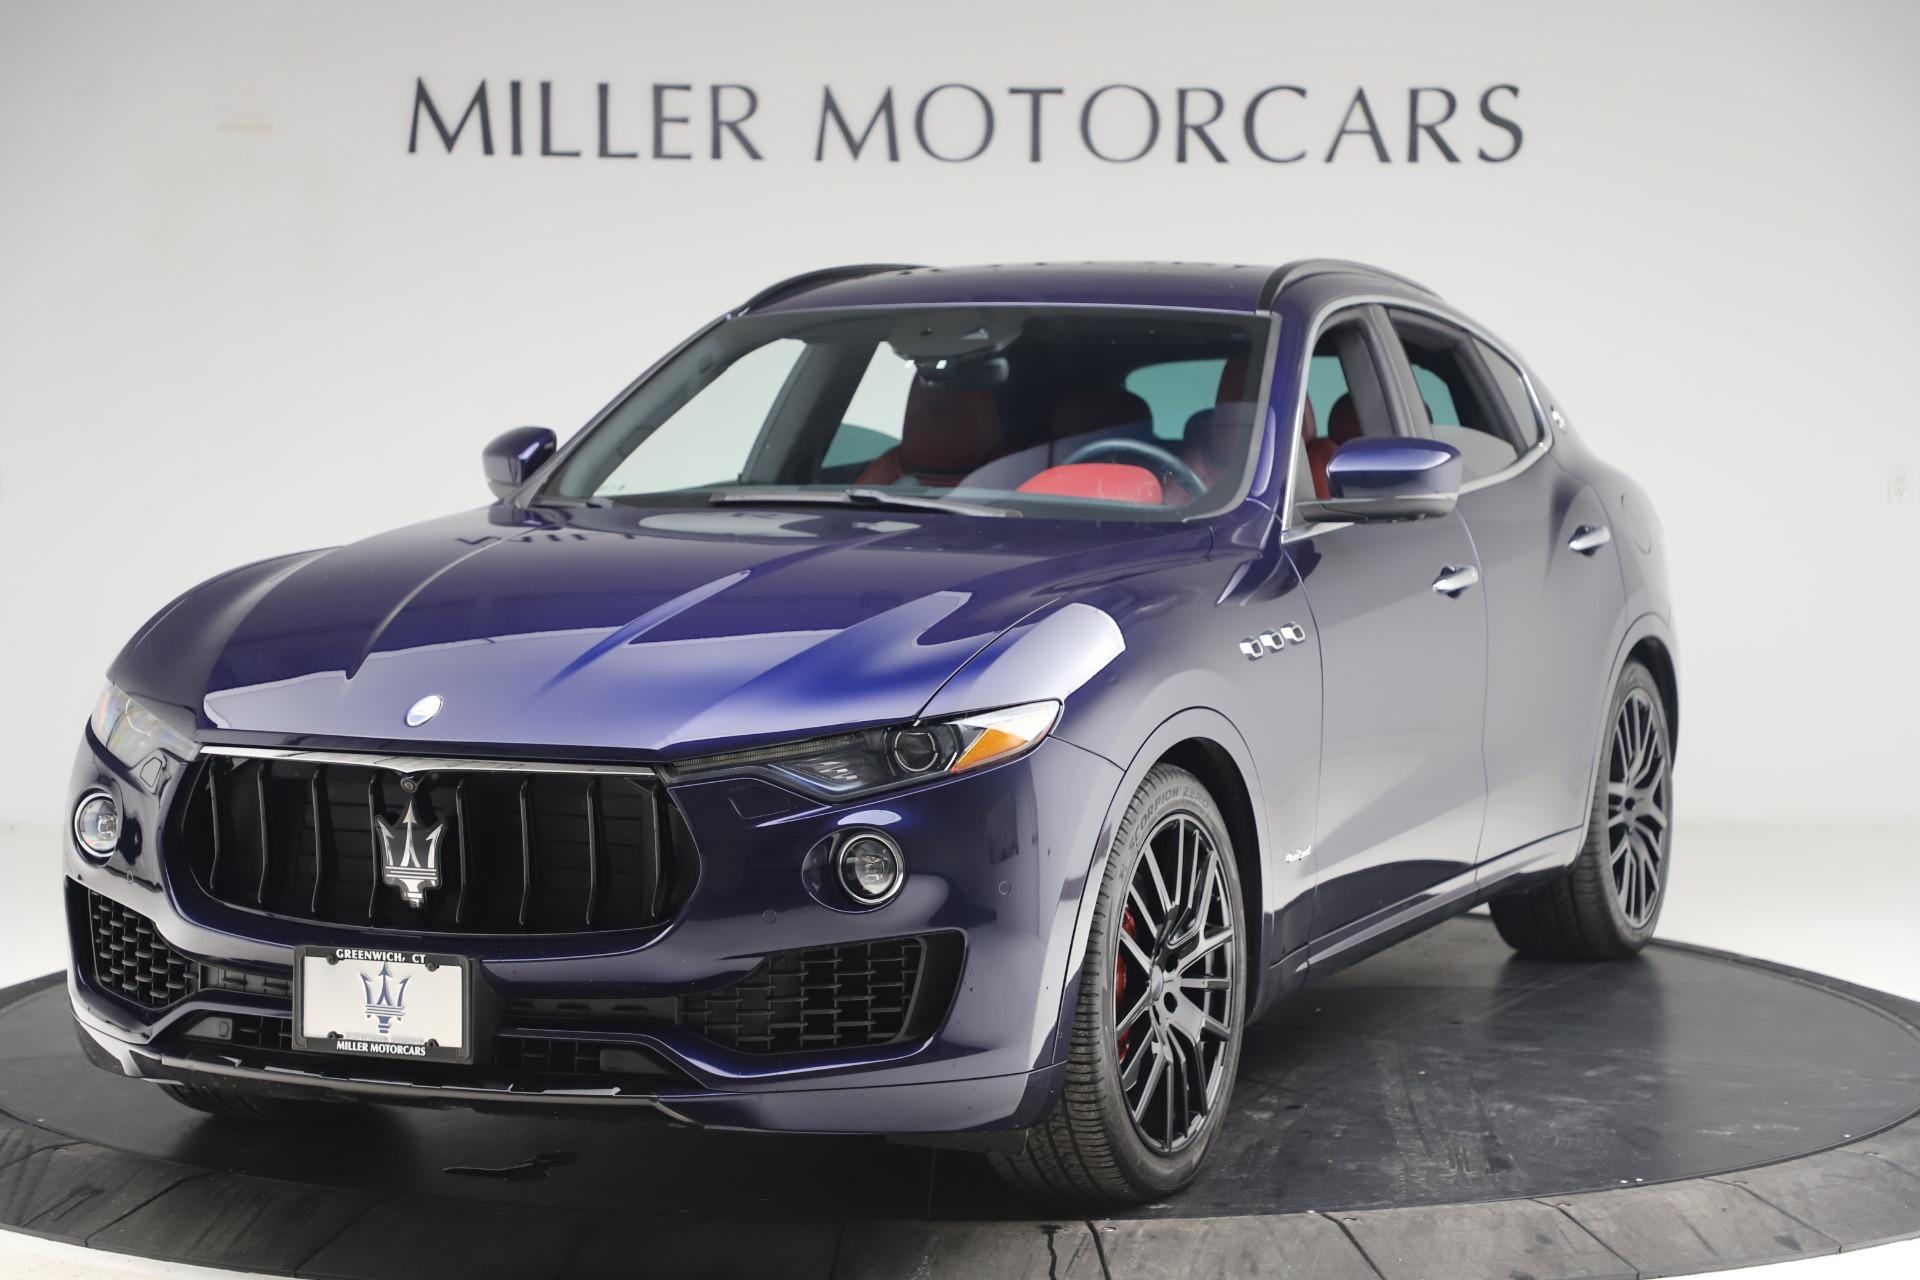 New-2018-Maserati-Levante-S-GranSport